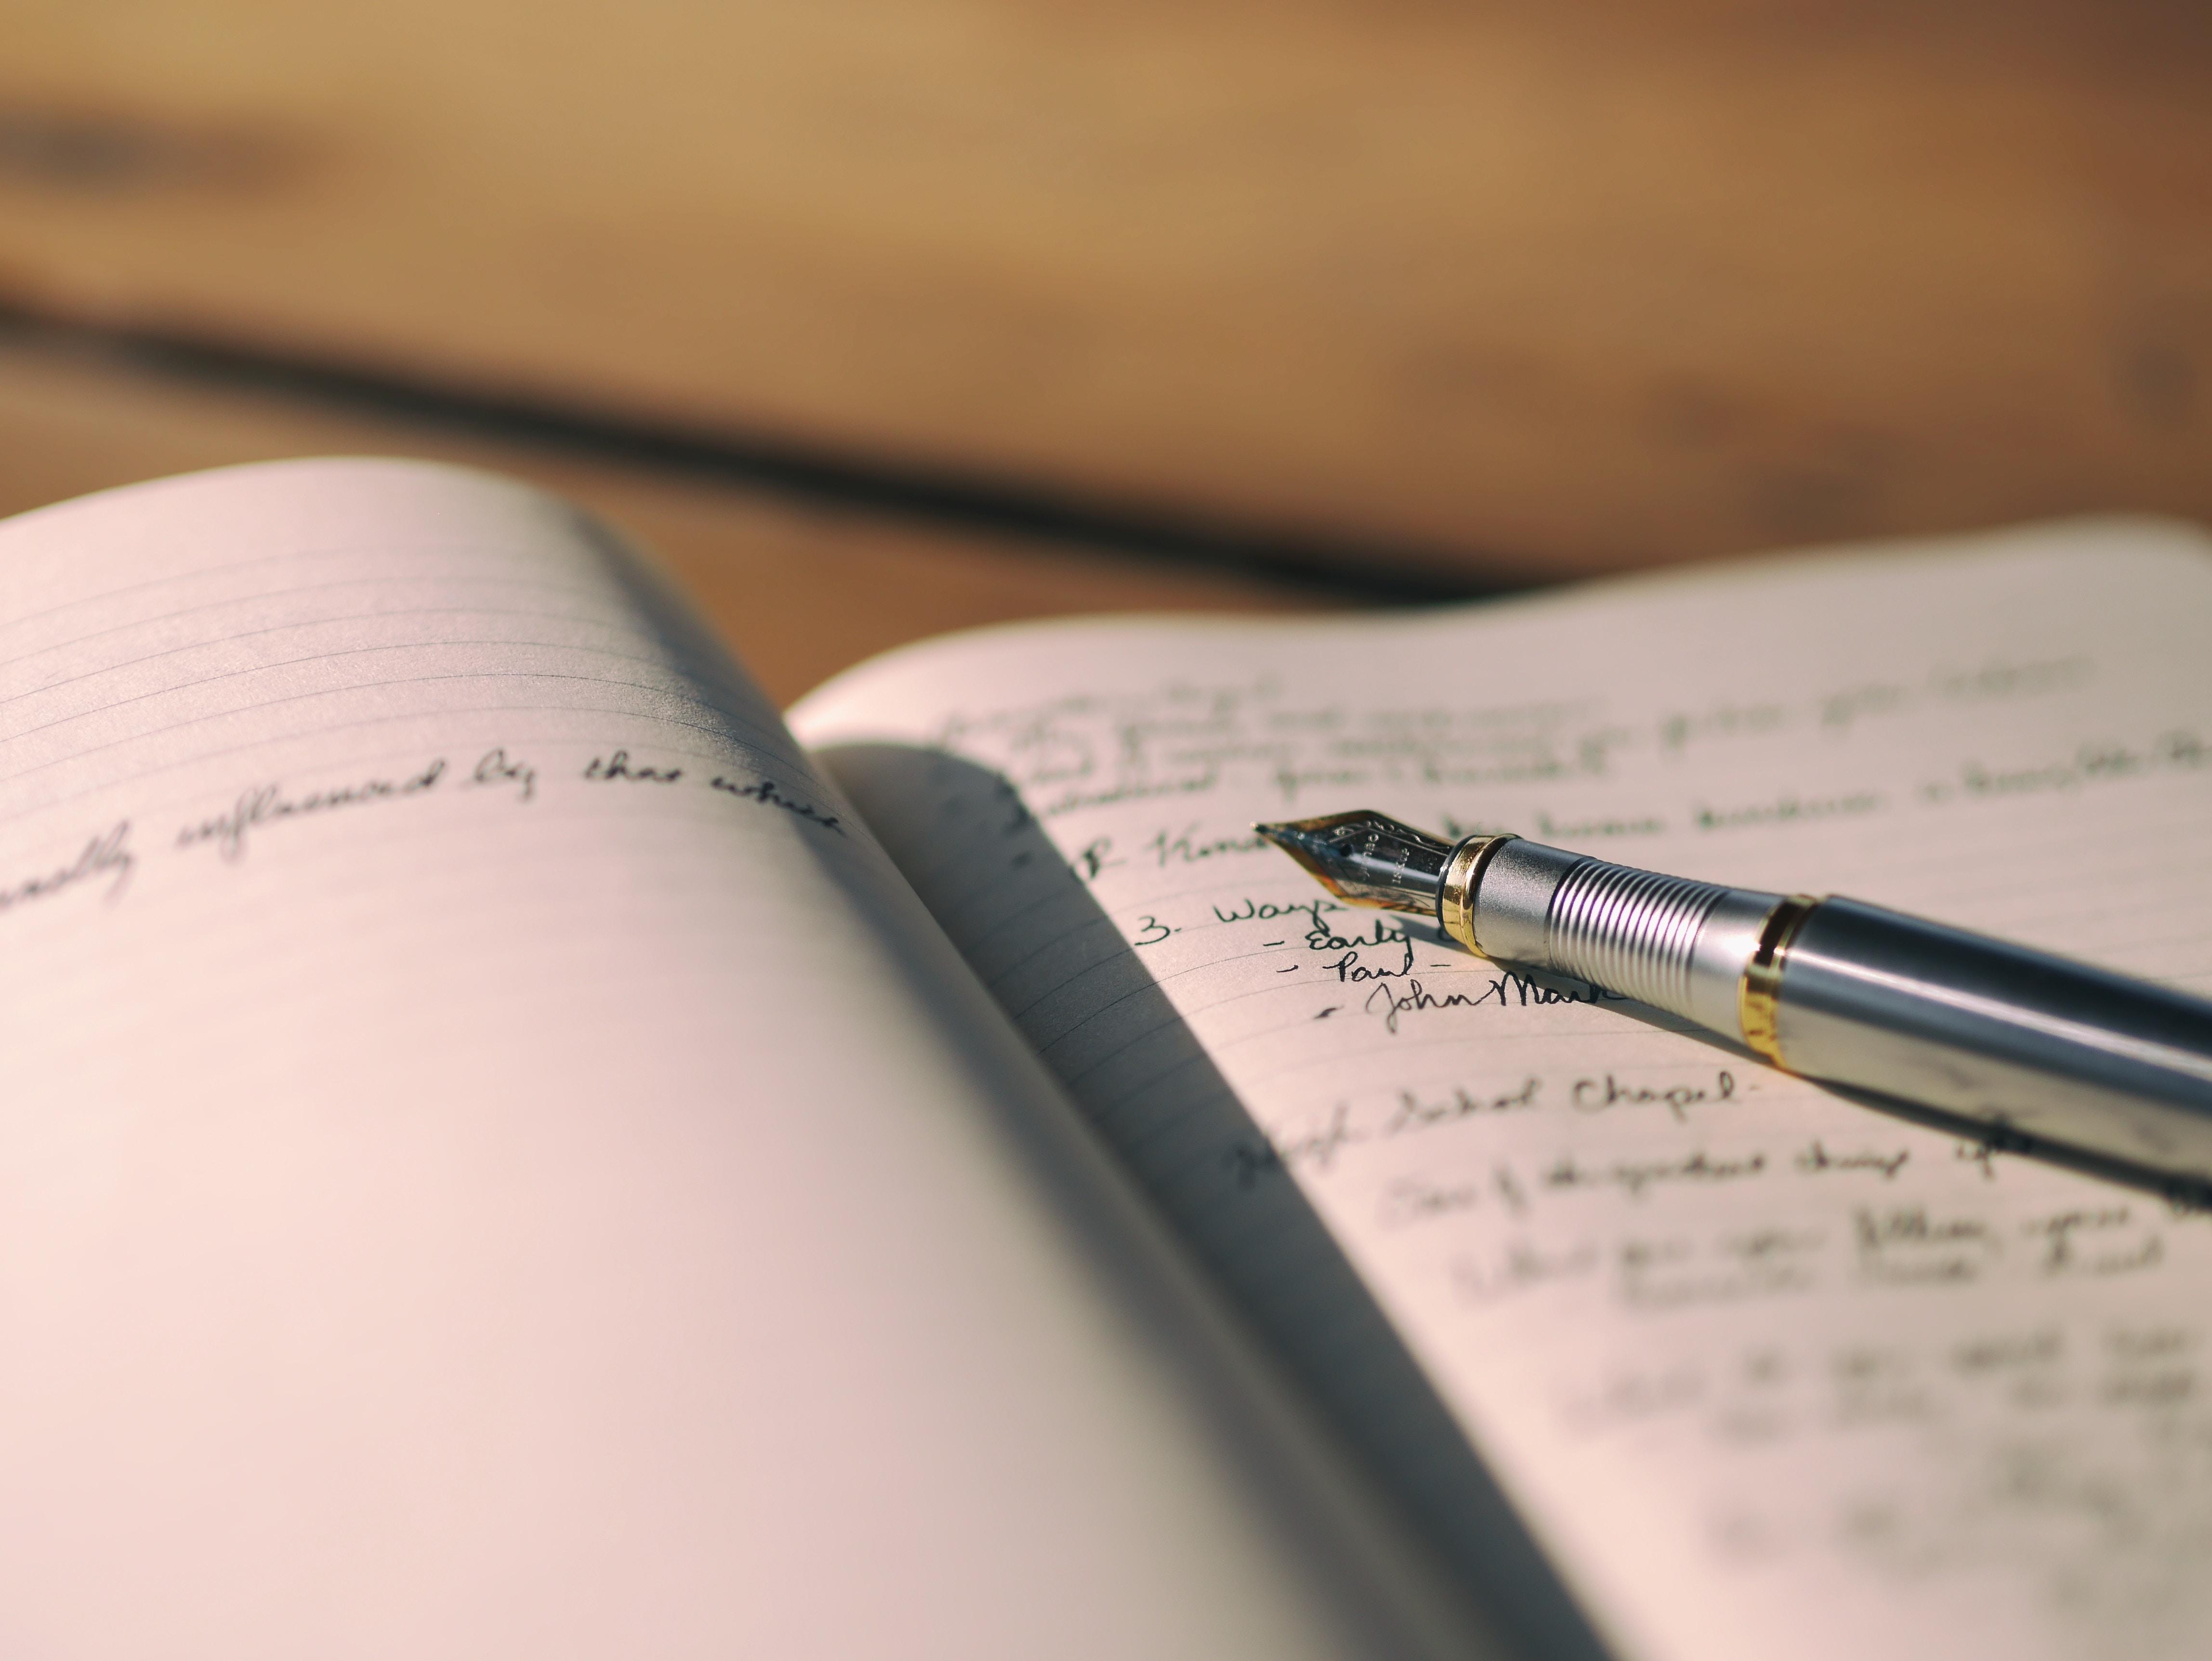 Day 7: Life journaling & Mindfulness